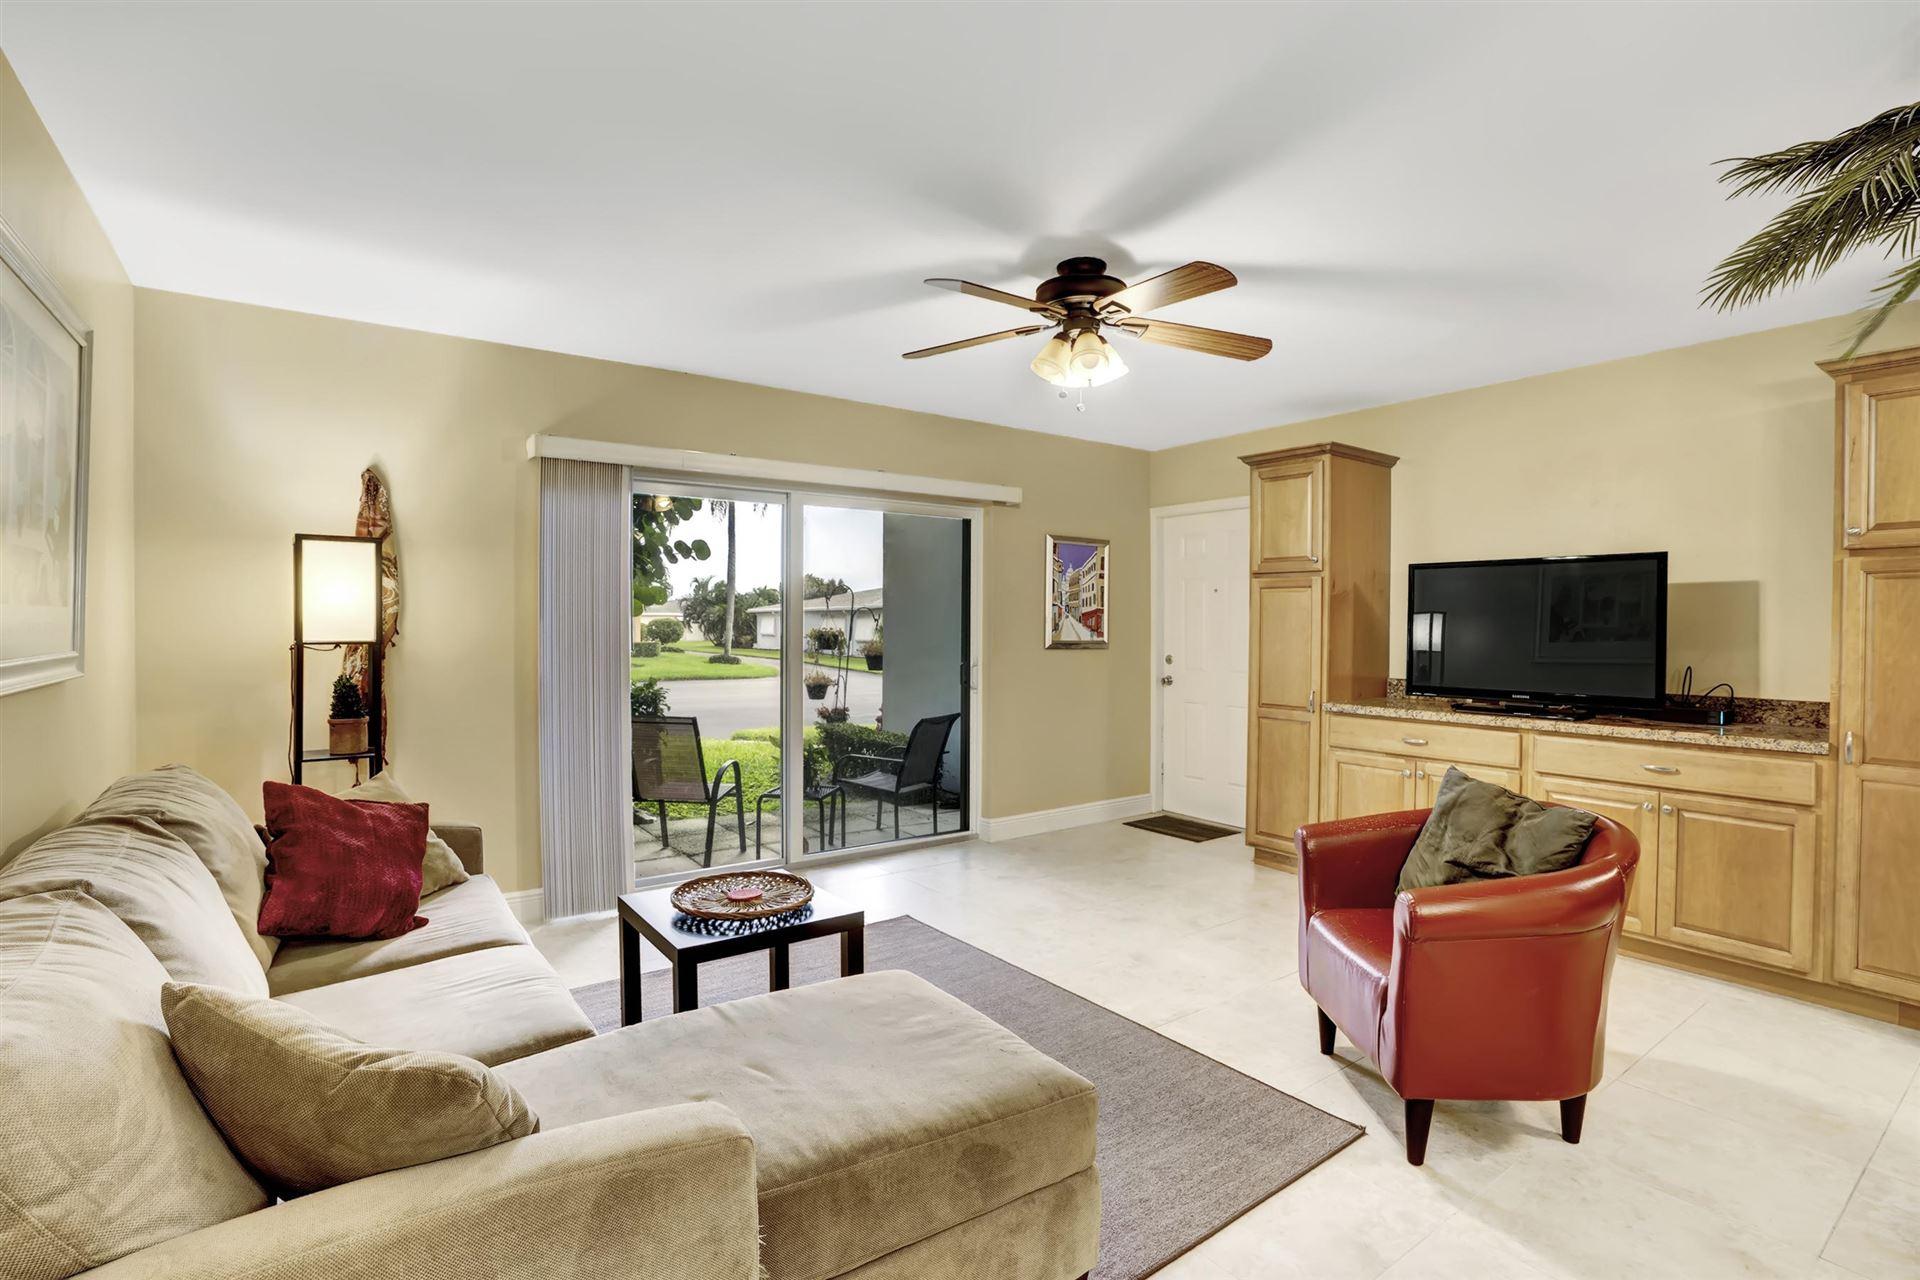 225 Main Boulevard #1b, Boynton Beach, FL 33435 - #: RX-10665208